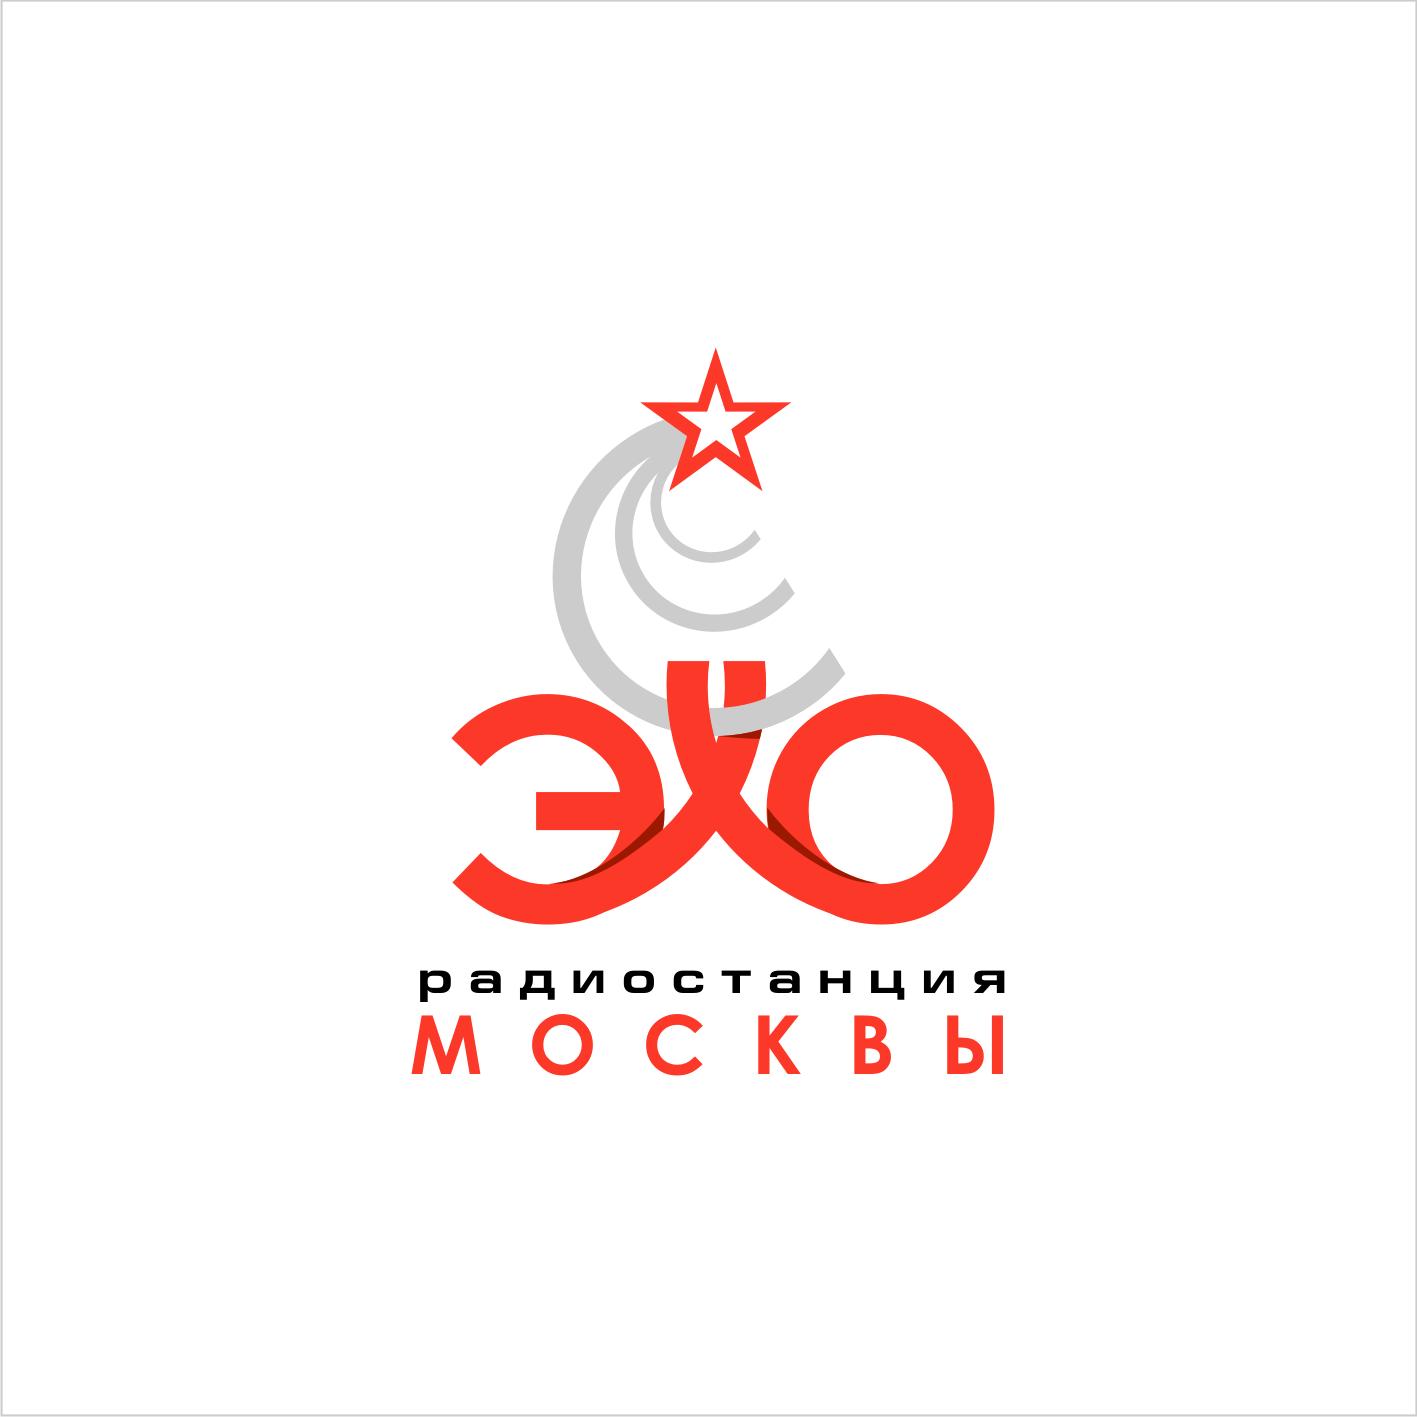 Дизайн логотипа р/с Эхо Москвы. фото f_22356266f376f84f.jpg